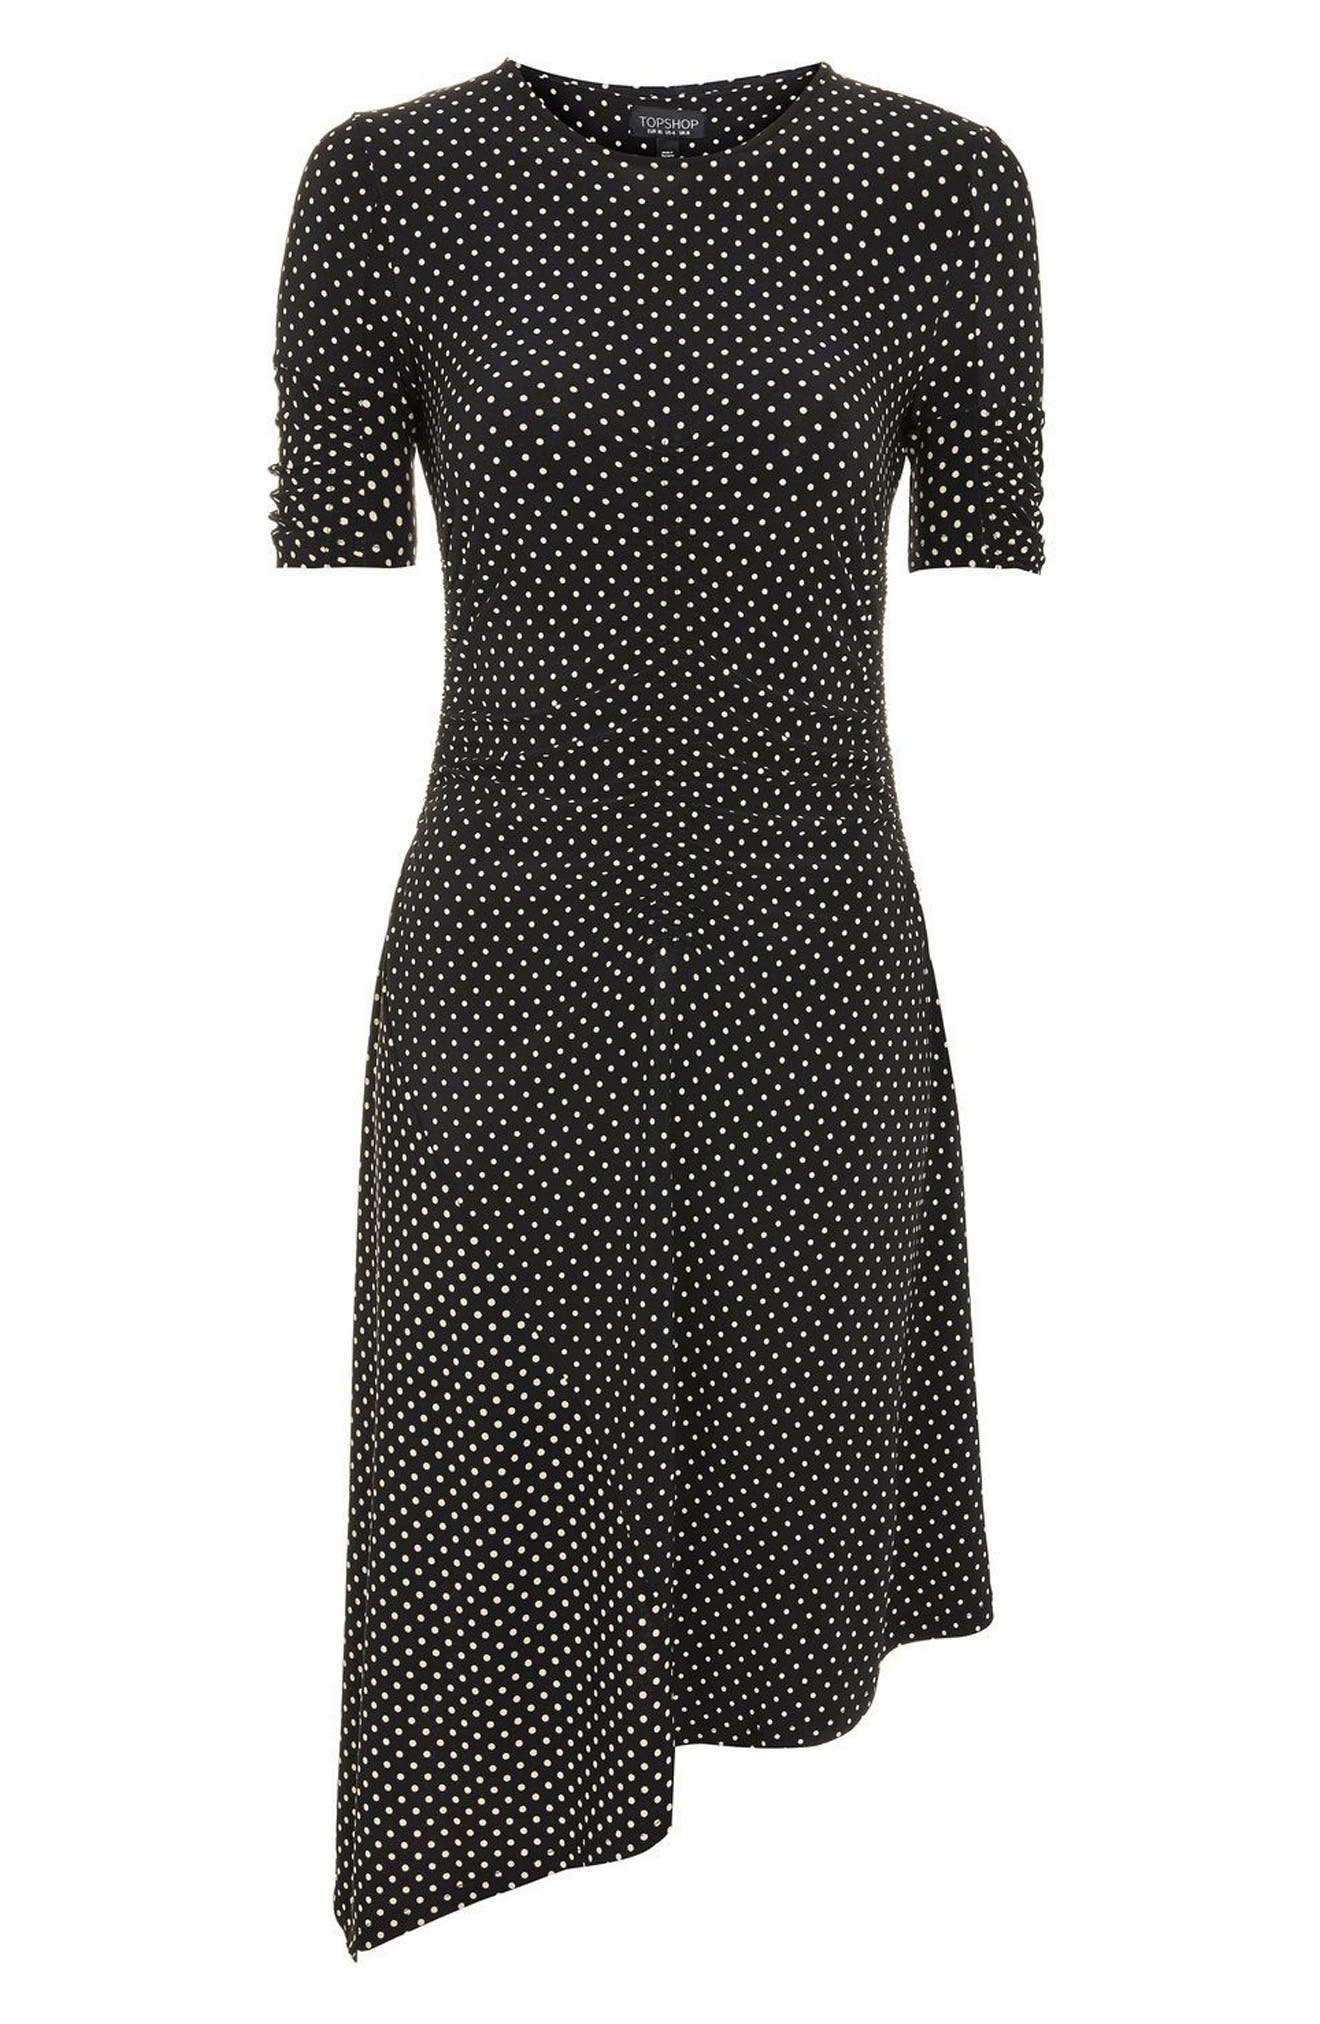 Polka Dot Asymmetrical Midi Dress,                             Alternate thumbnail 4, color,                             Black Multi